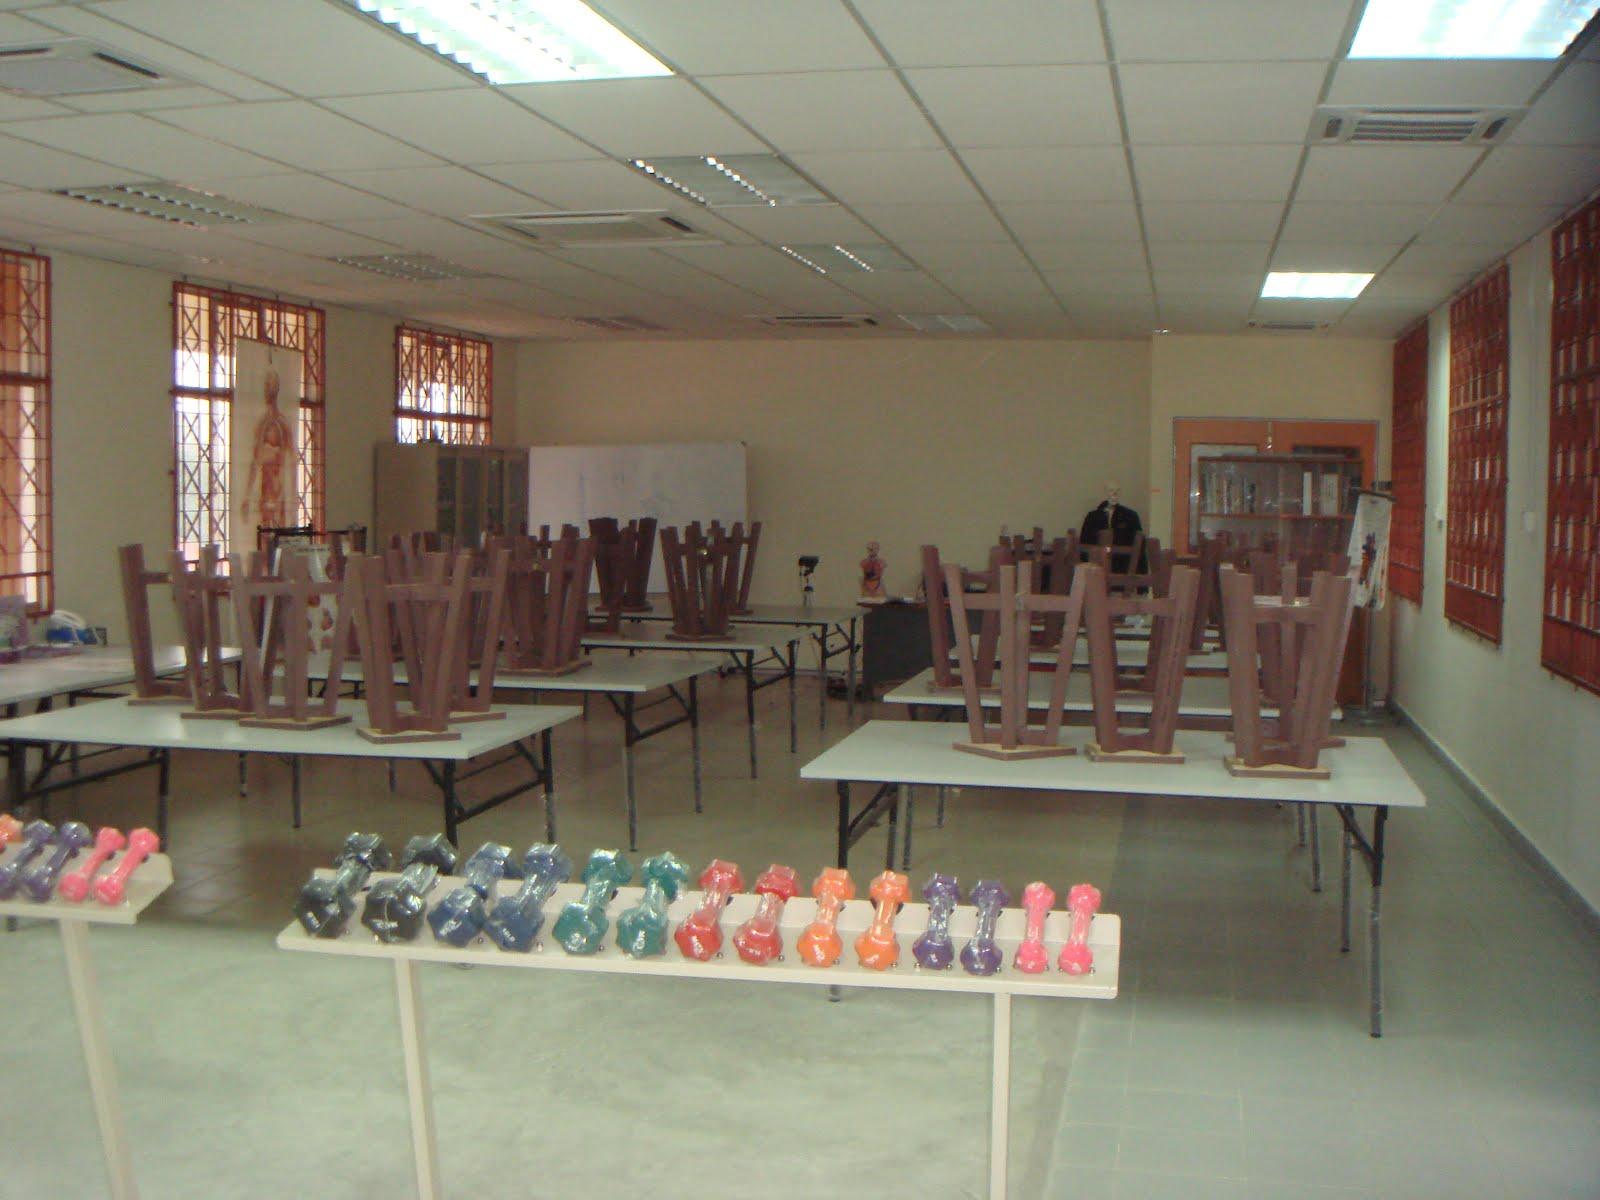 sains sukan 23 pengajian sains sukan di institut pengajian tinggi di malaysia yang menawarkan program sains sukan.